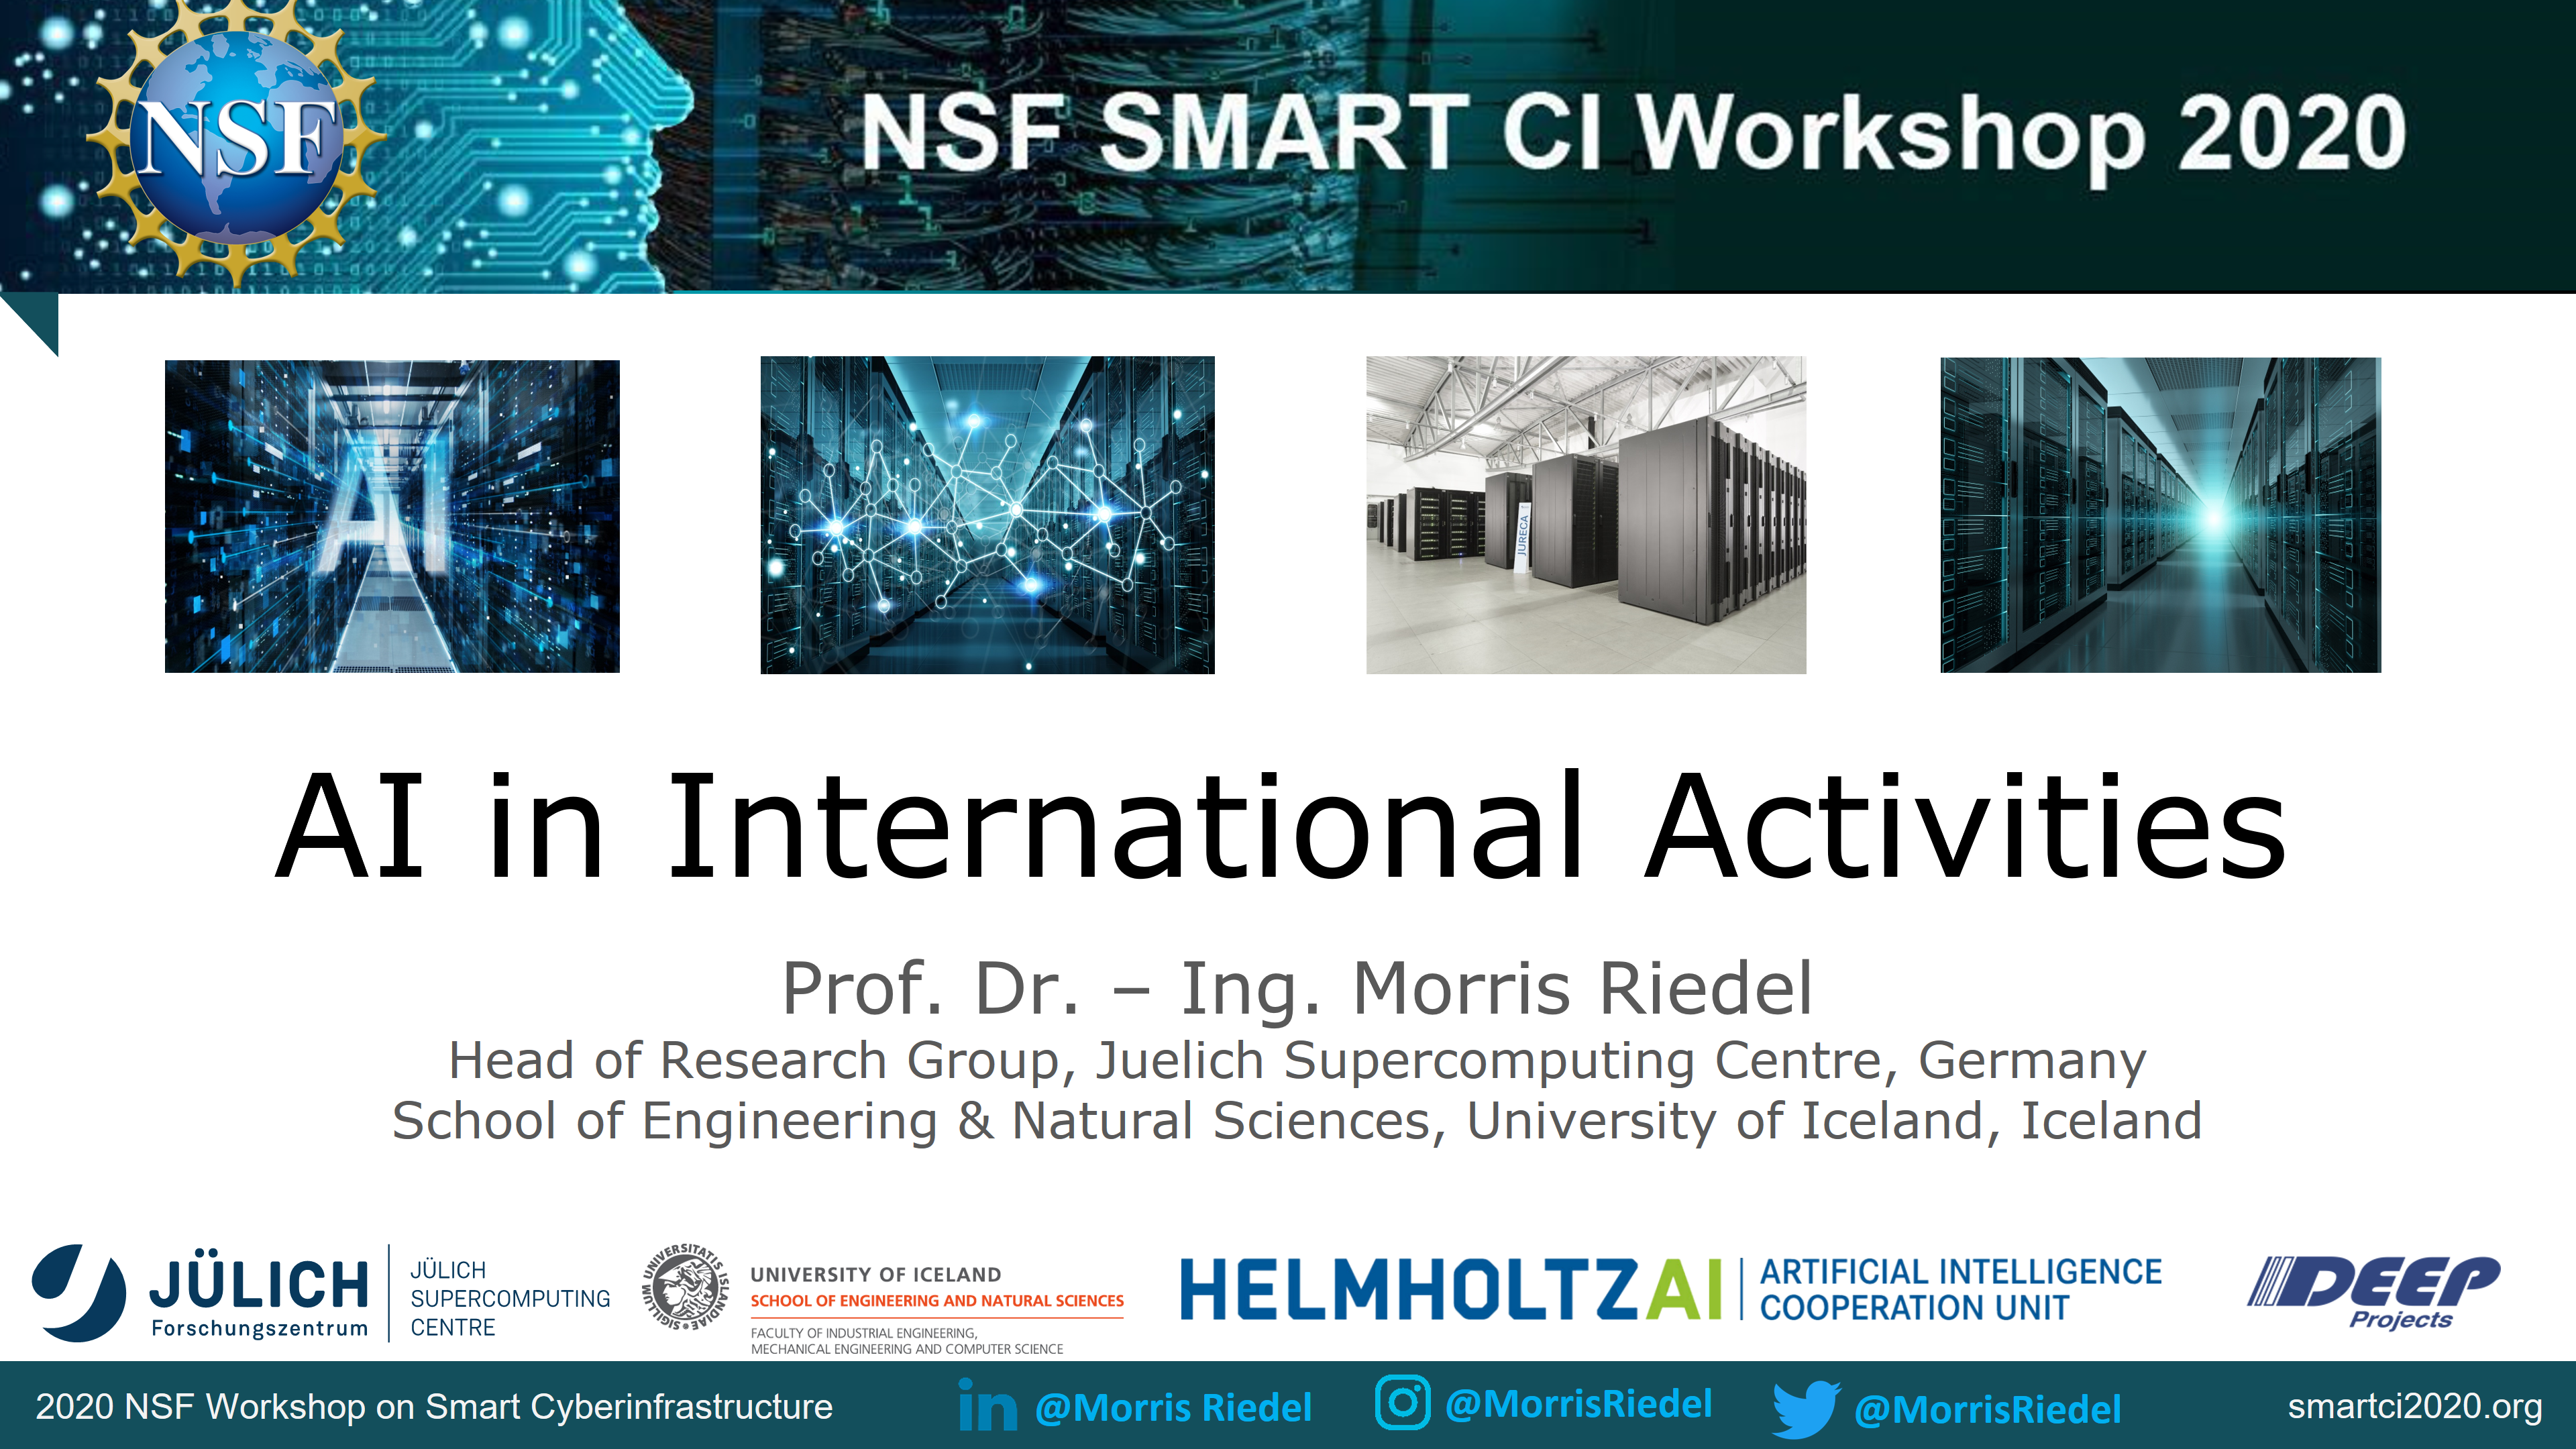 AI in International Activities Morris Riedel